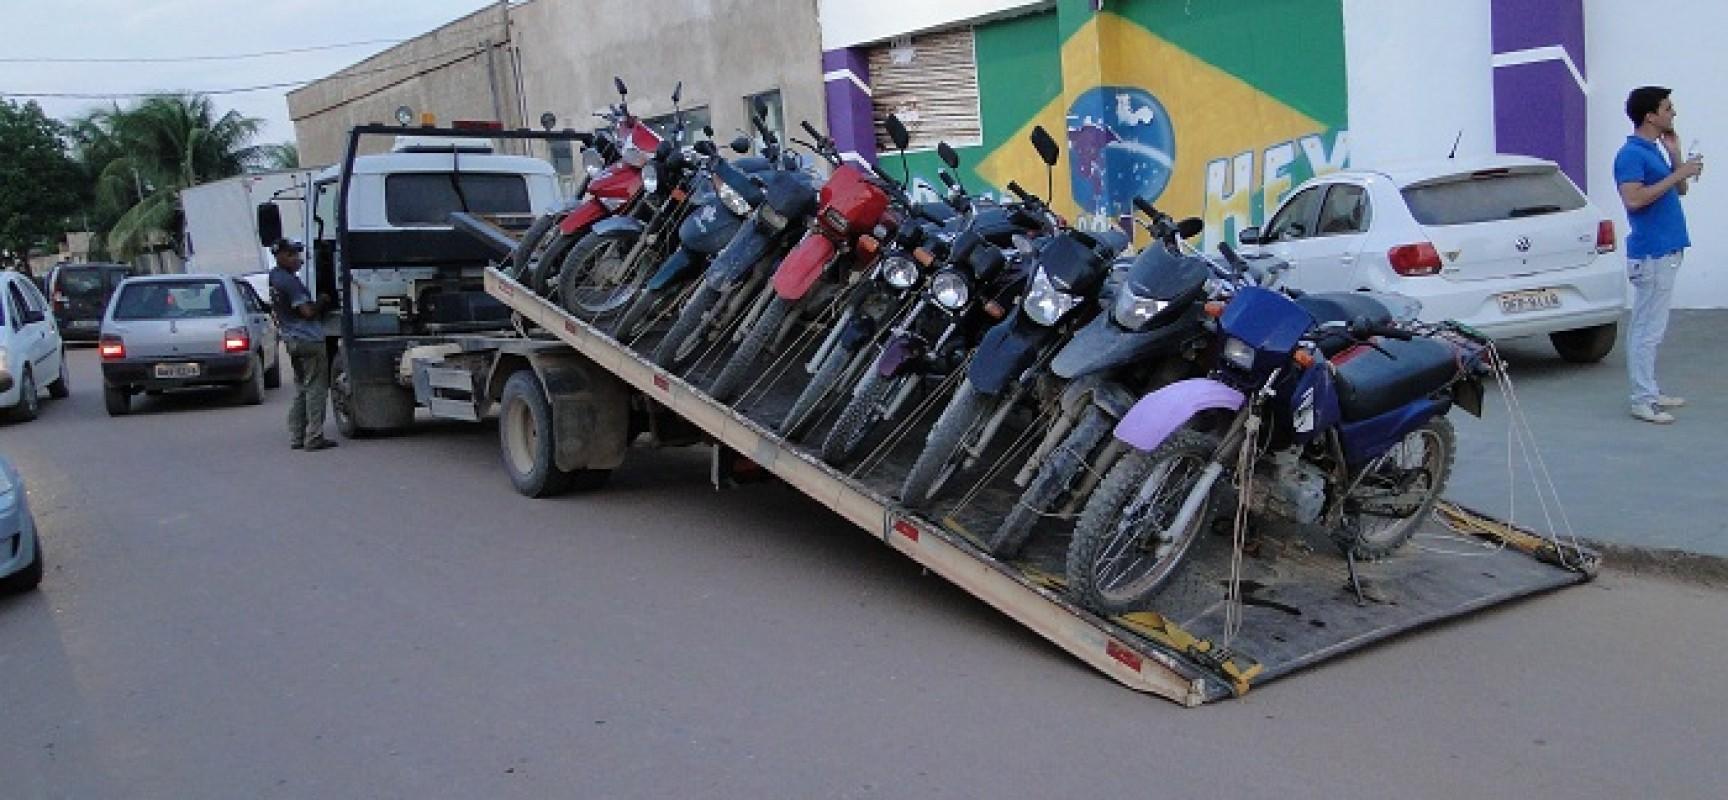 Motocicletas apreendidas.